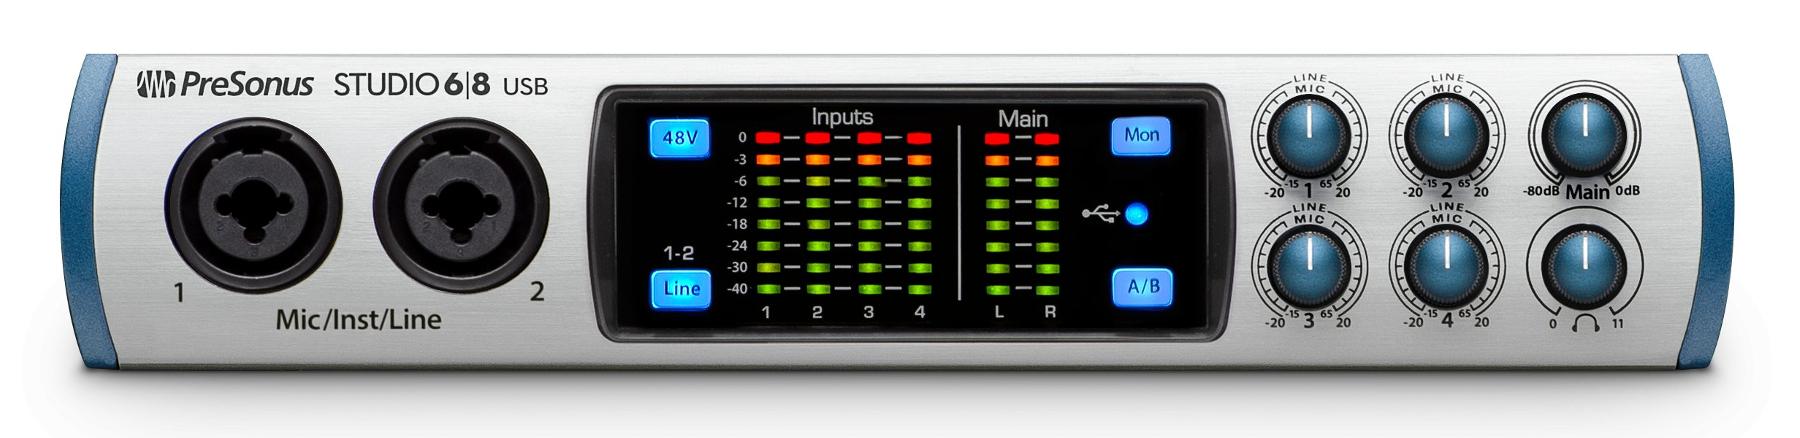 6x6 USB 2.0 Audio/MIDI Interface